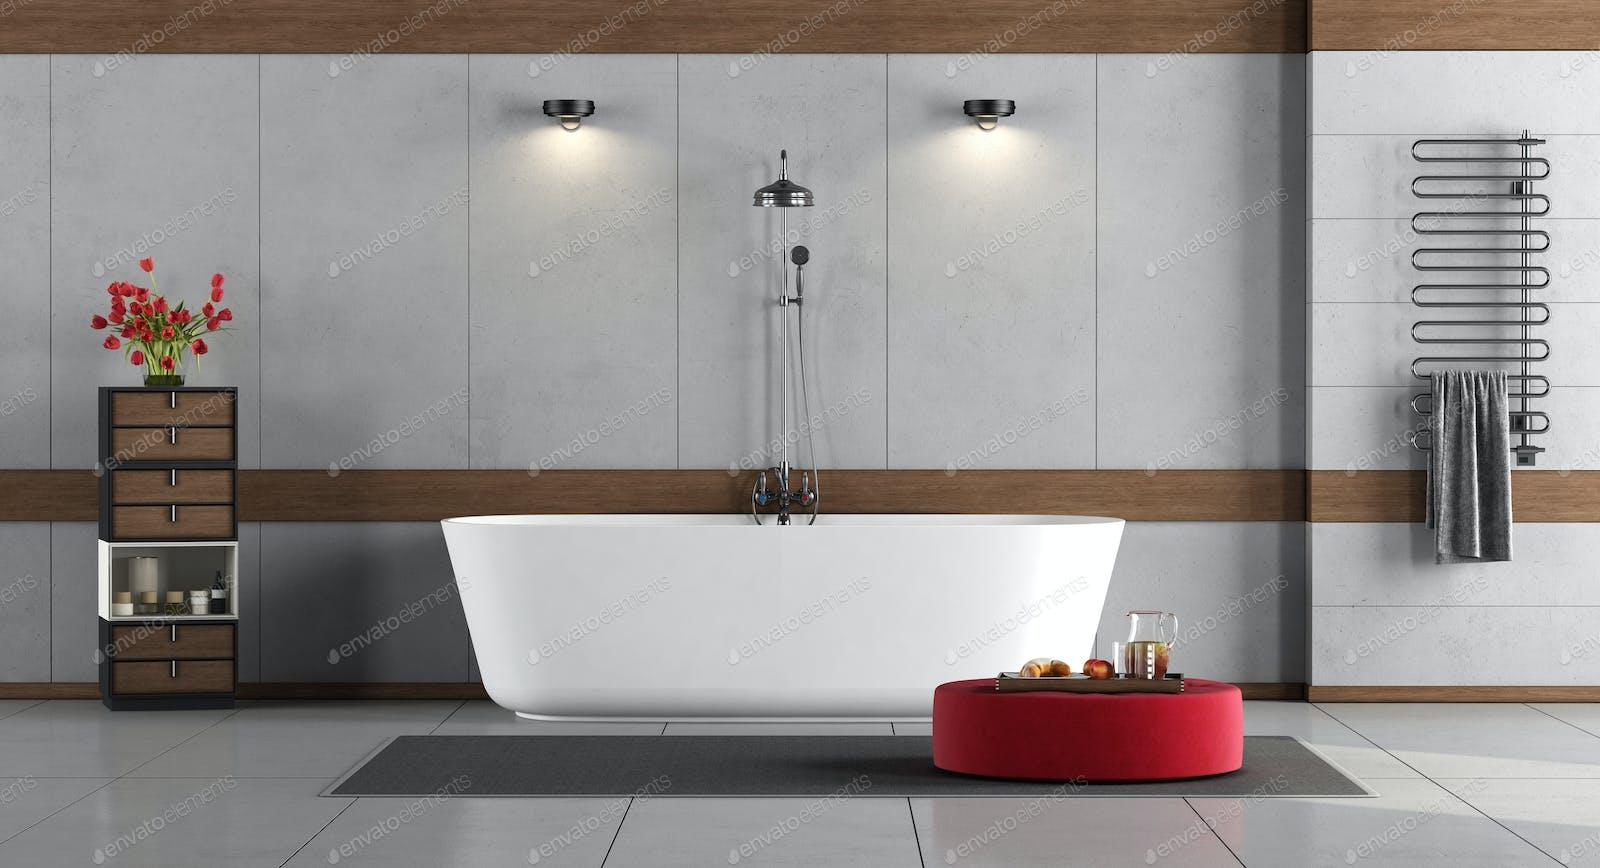 Minimalist Bathroom With Bathtub And